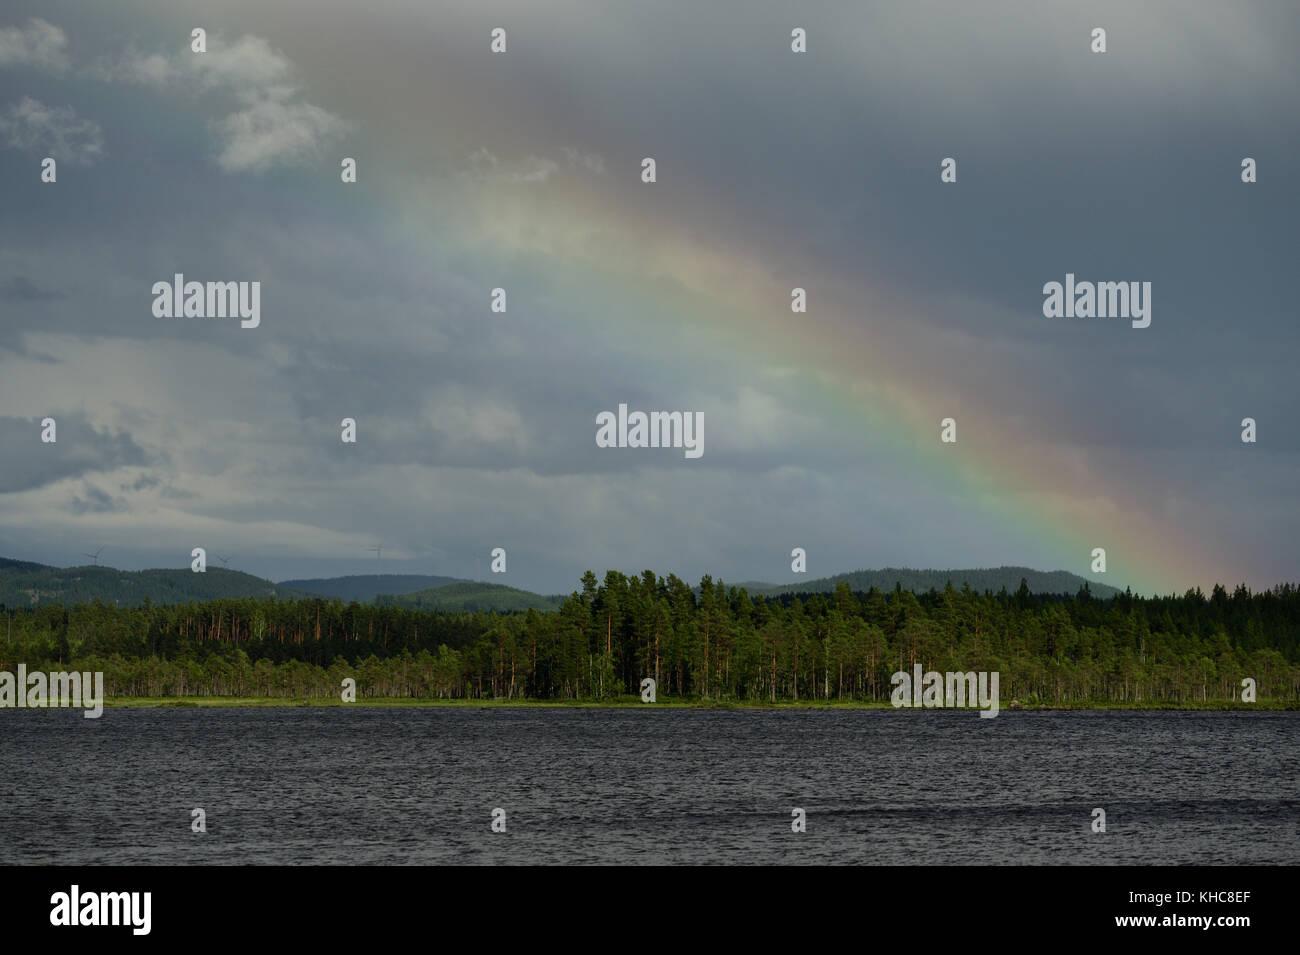 Lake, Örklingen, thunderstorm, rainbow, forest, hills, Johannisholm, Mora kommun, Dalarna county, Sweden *** - Stock Image